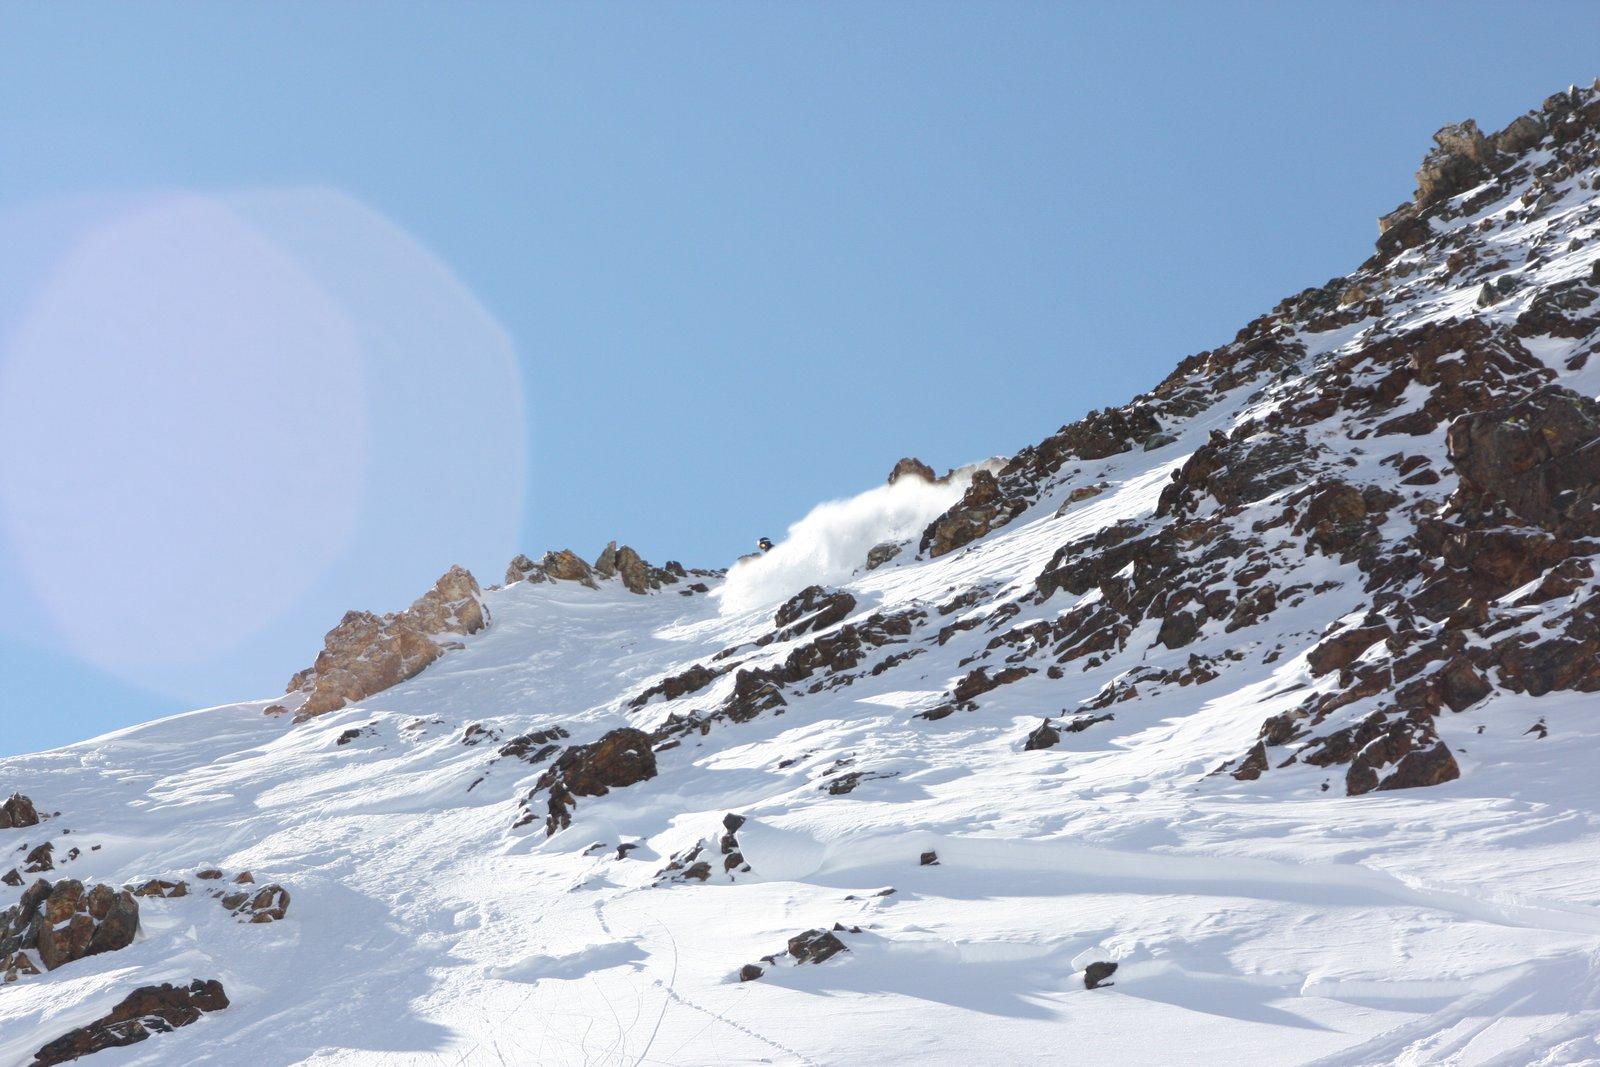 Breck Shred